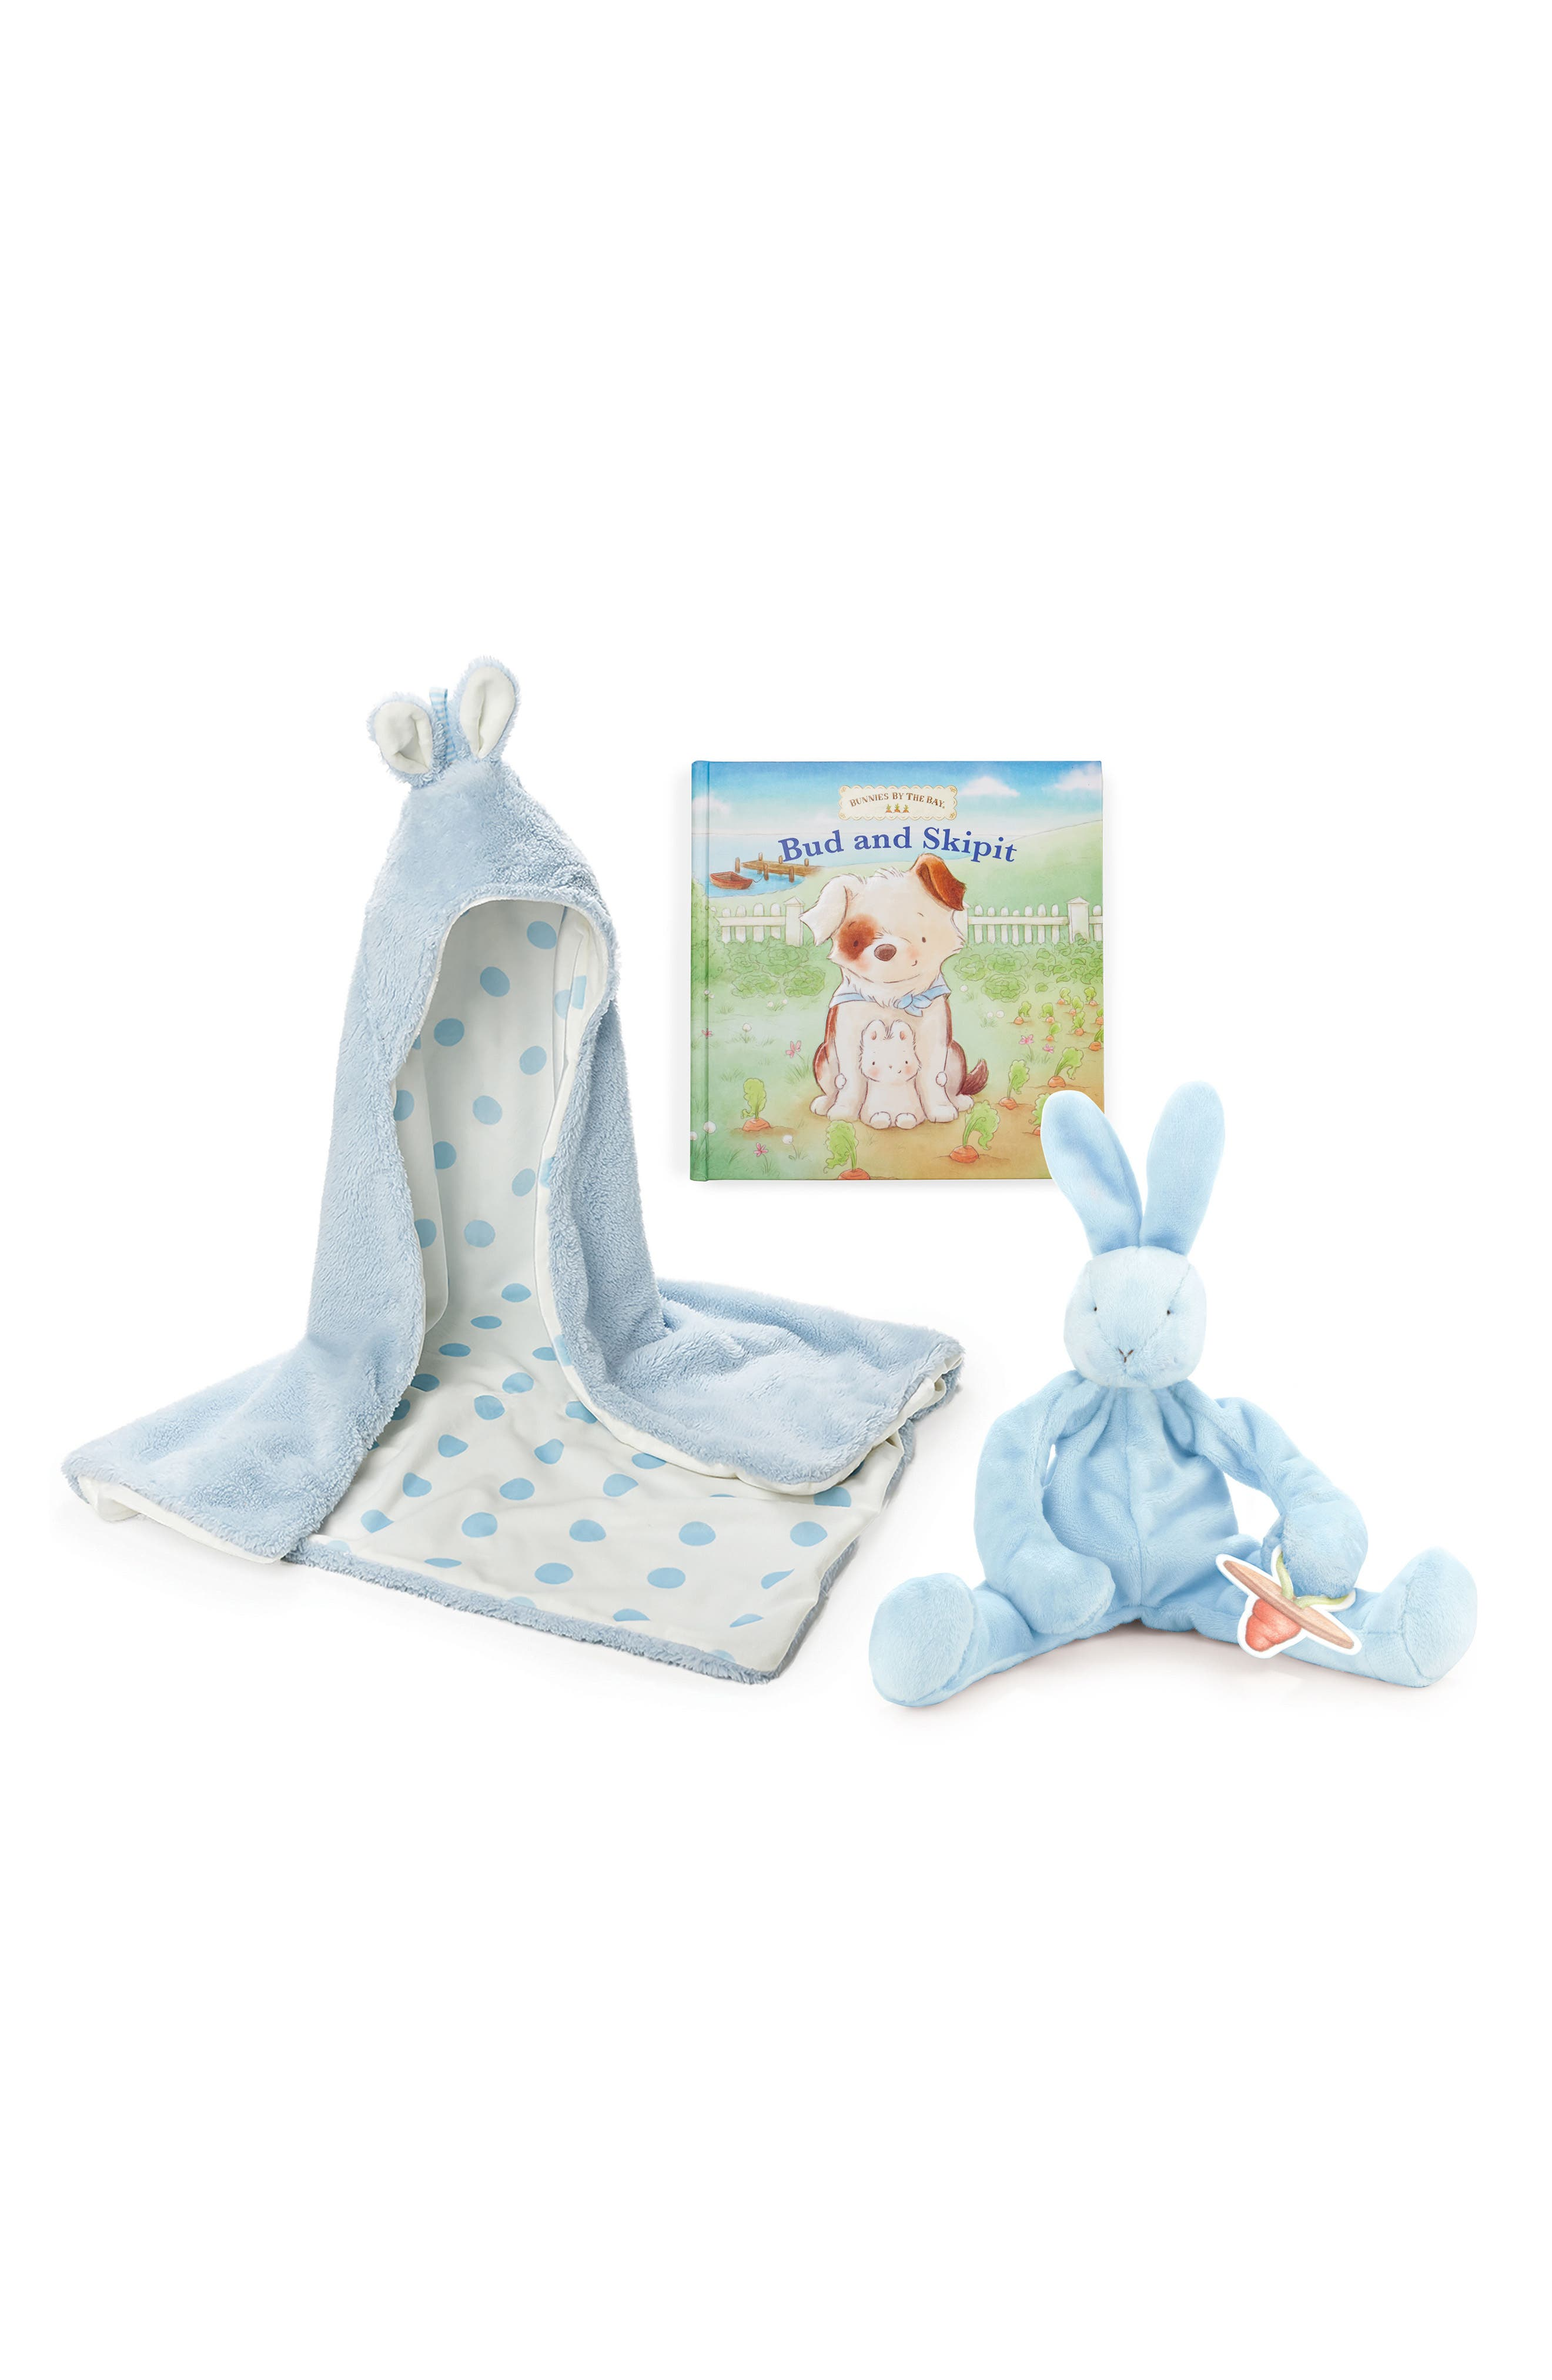 Hooded Blanket, Stuffed Animal & Board Book Set,                             Main thumbnail 1, color,                             450